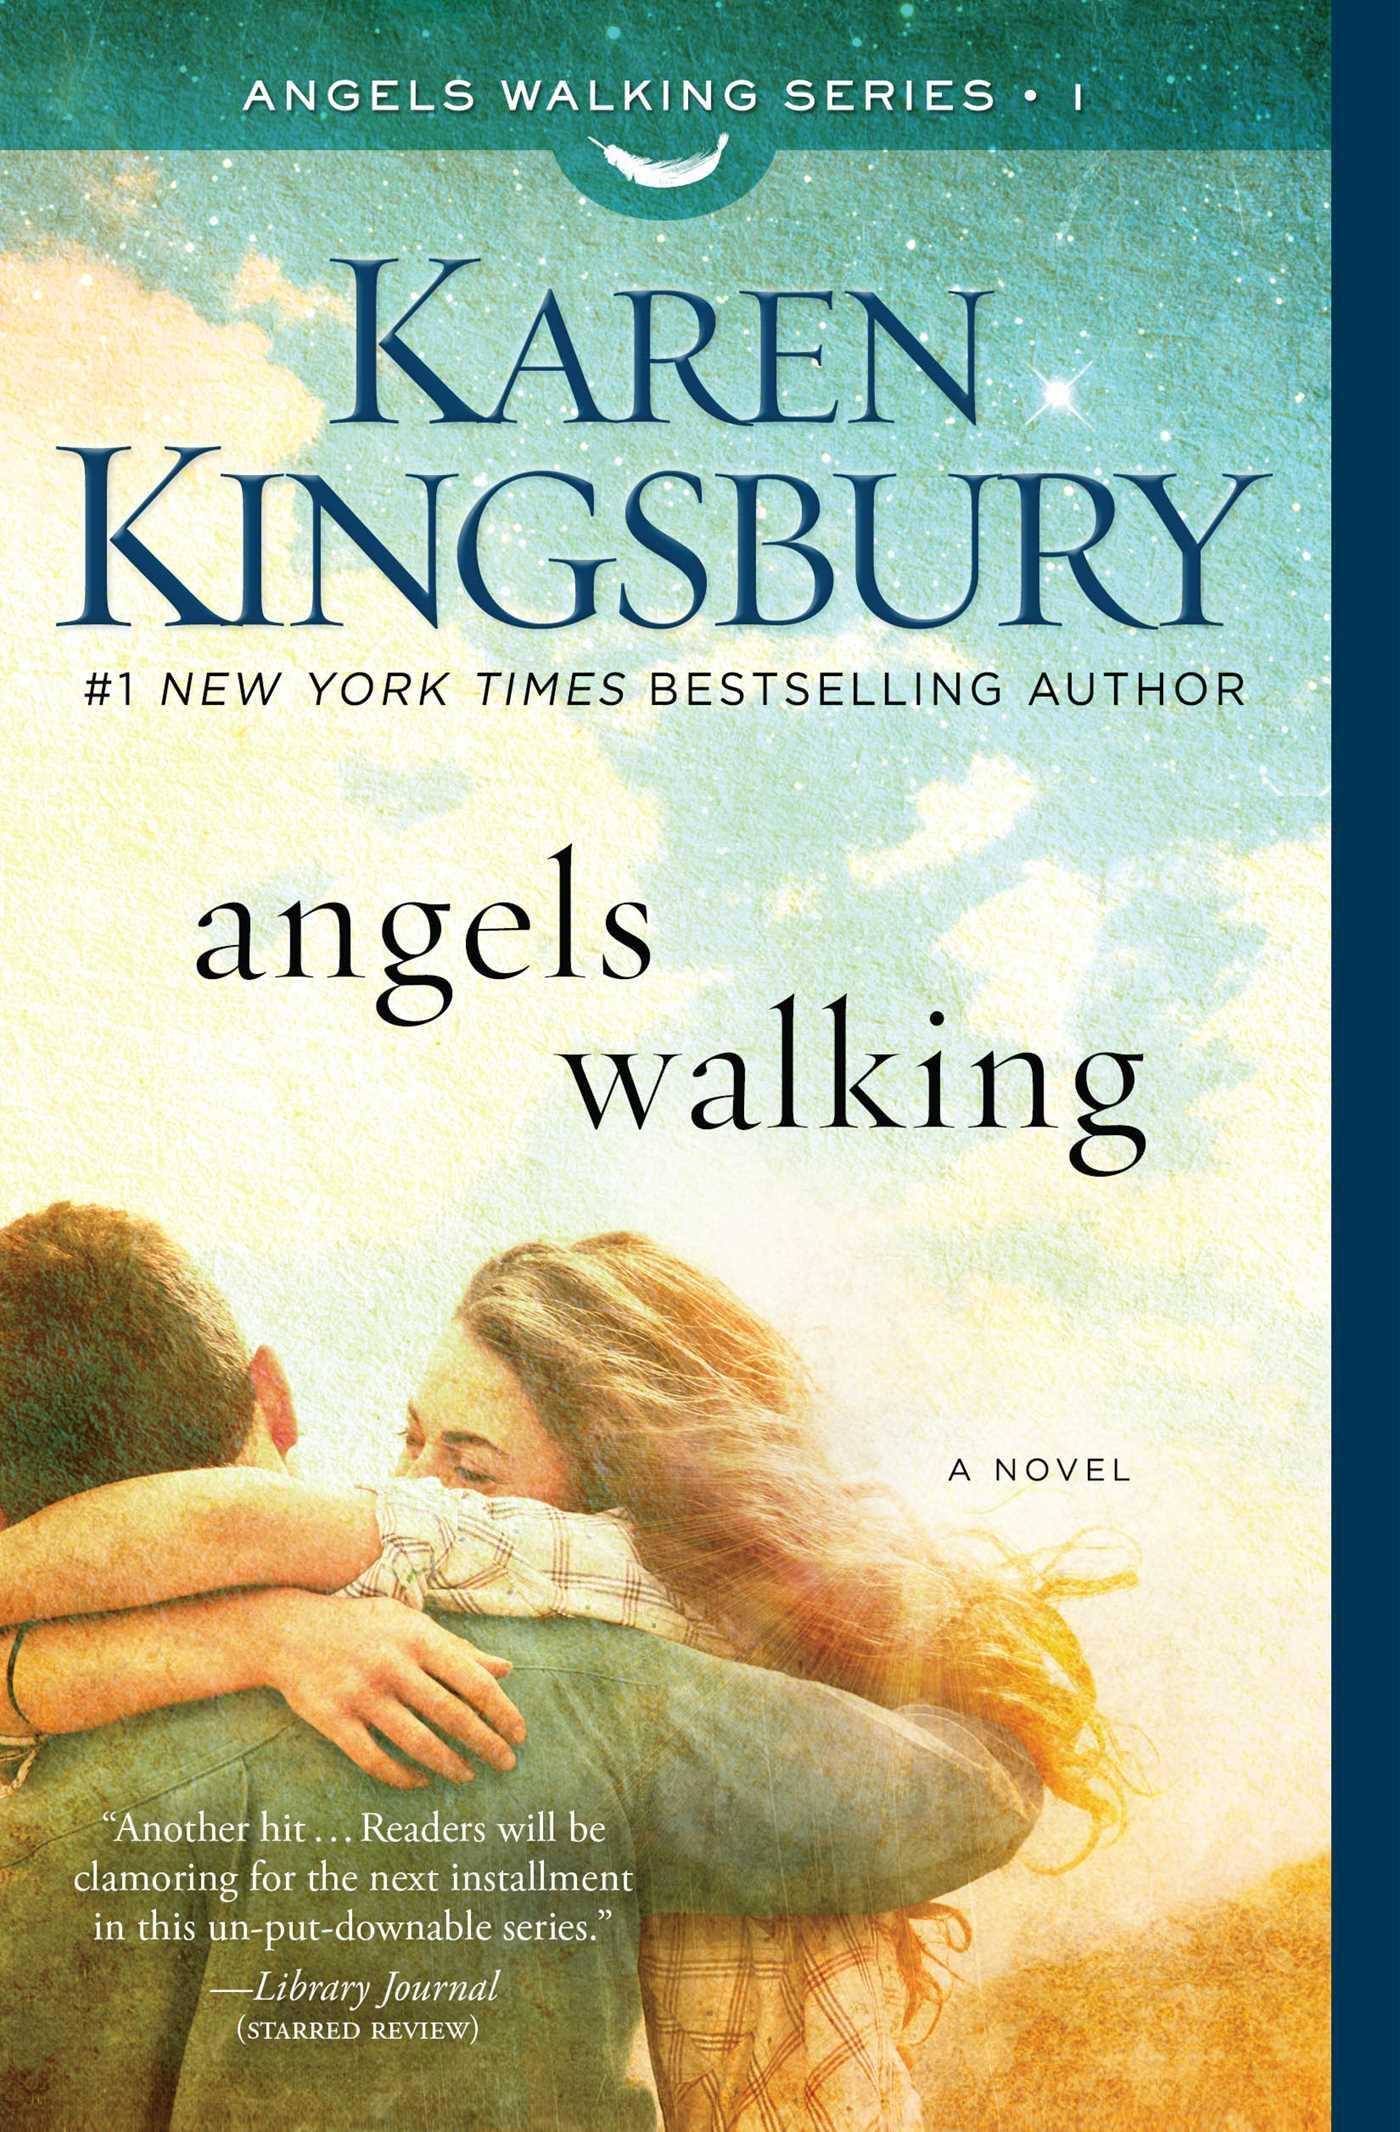 Angels walking 9781451687491 hr